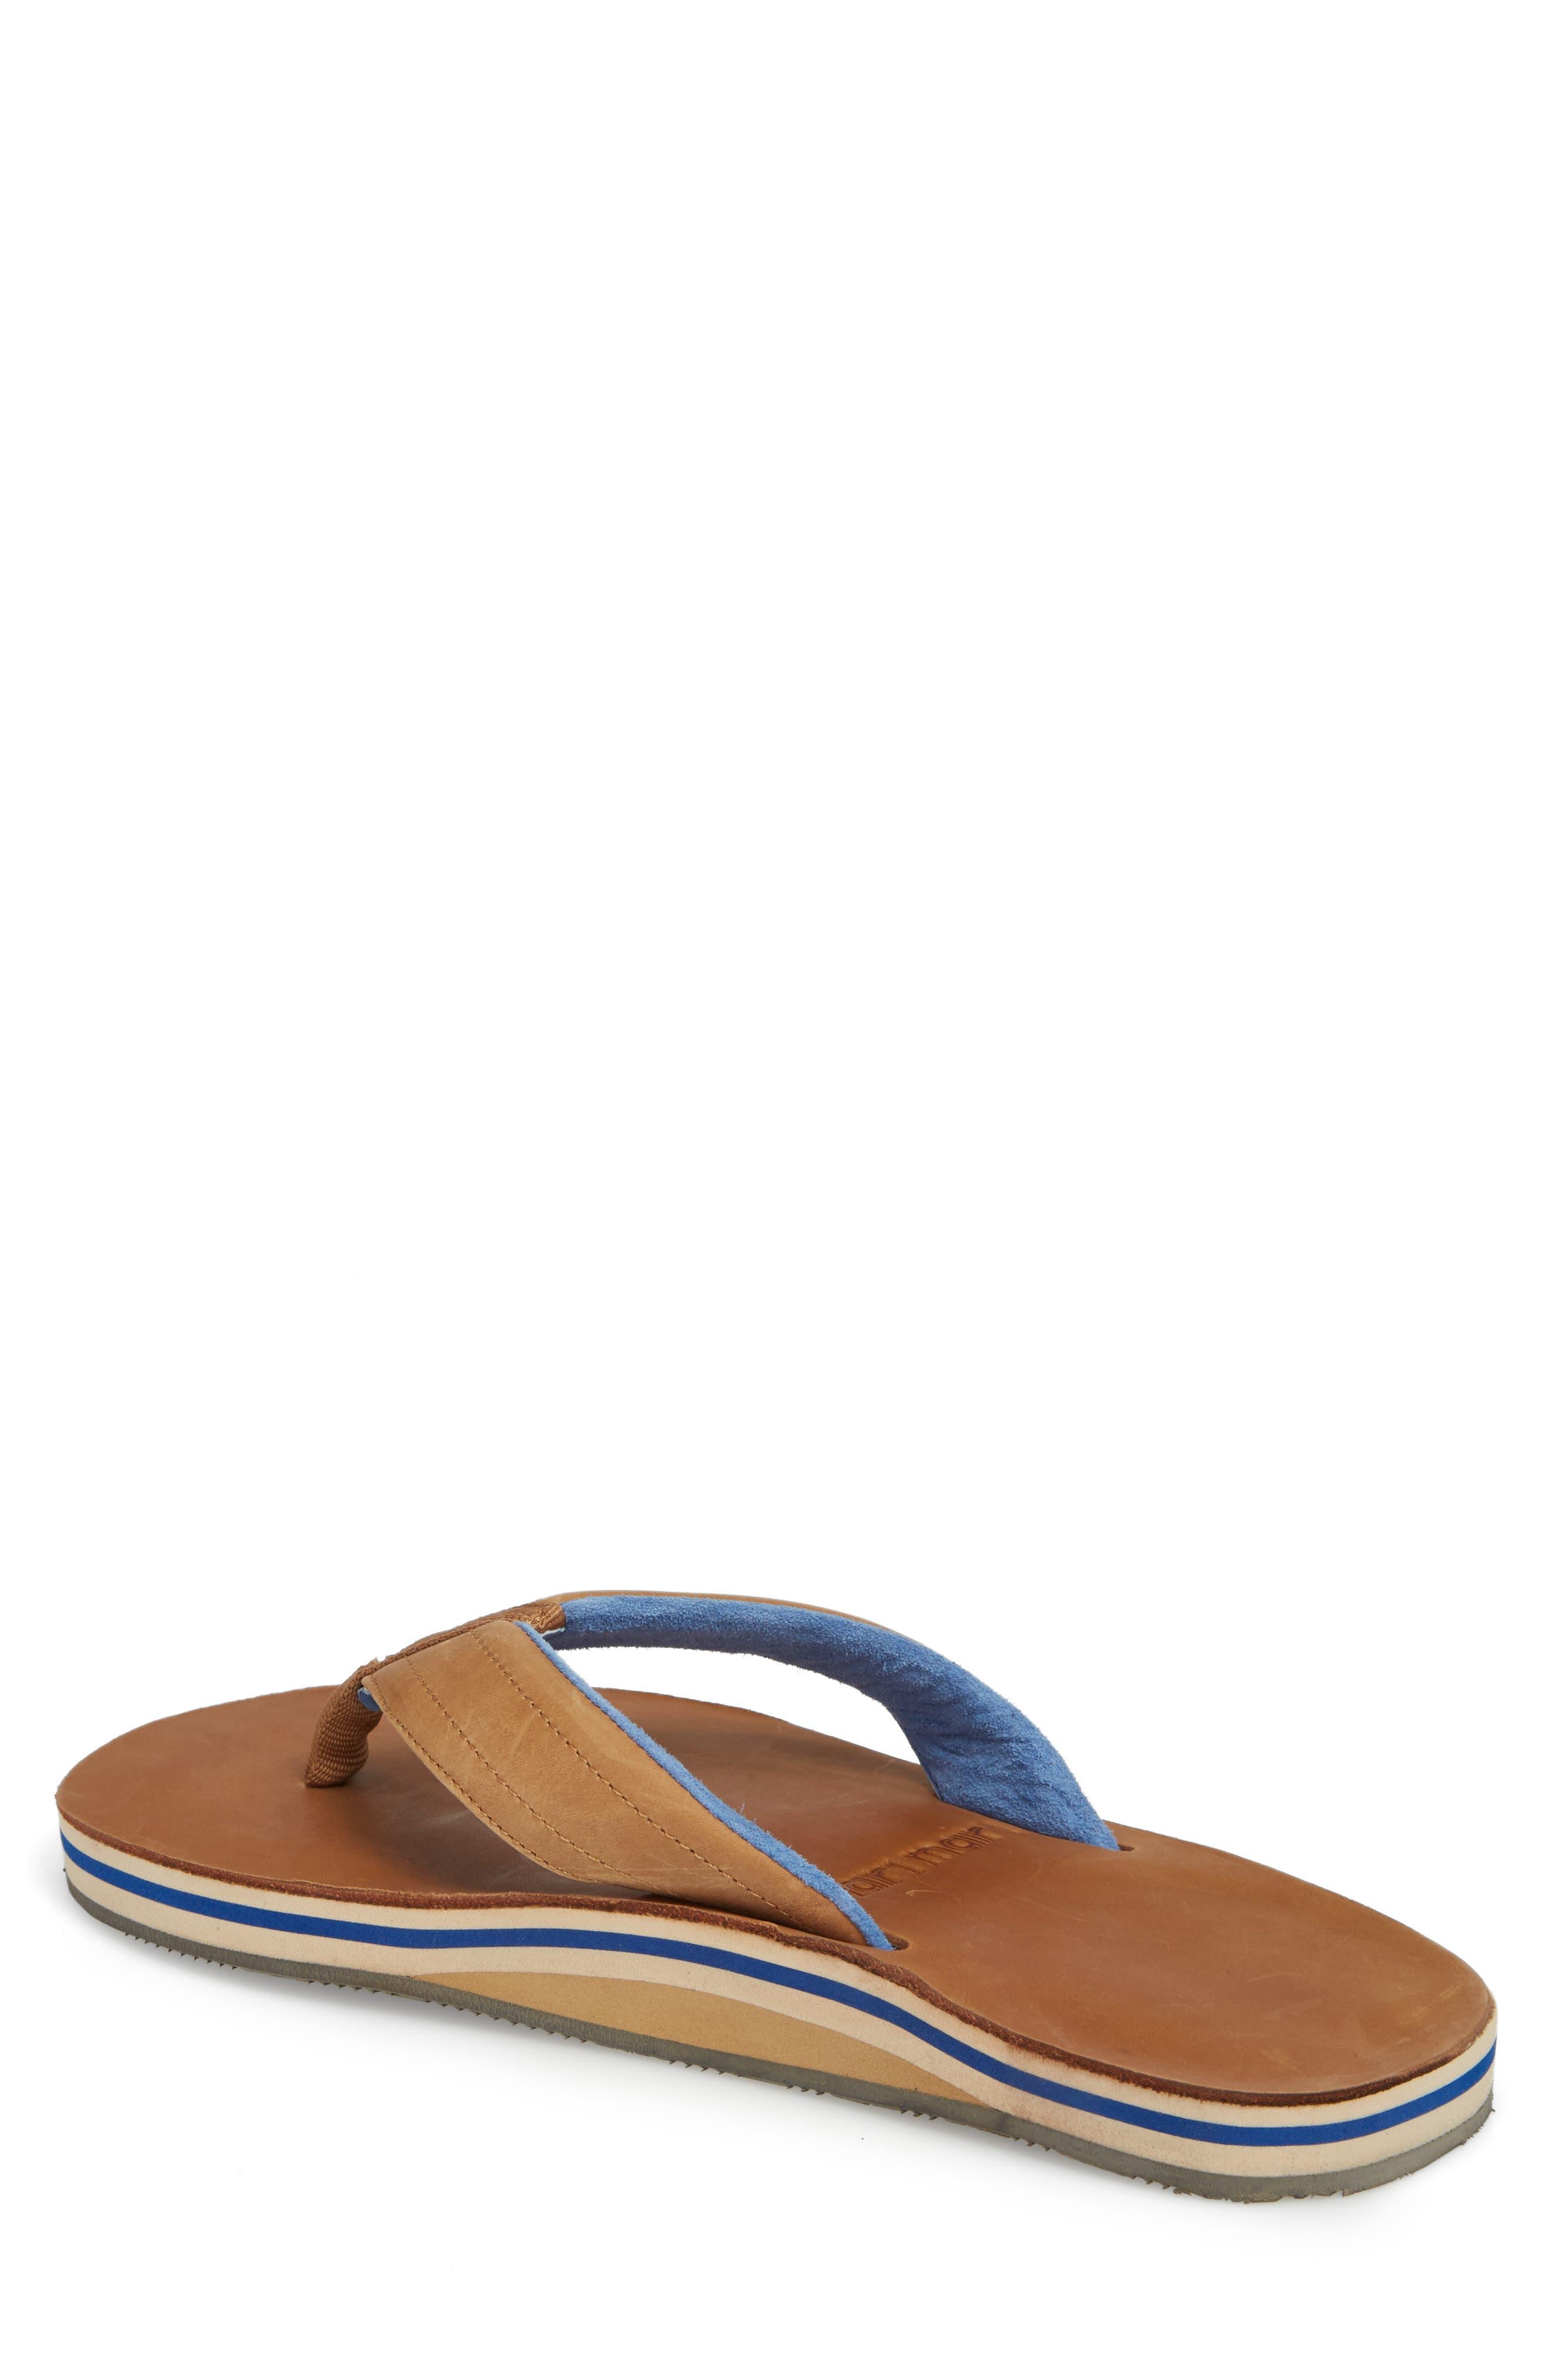 Lakes Sandwich Stripe Flip Flop,                             Alternate thumbnail 2, color,                             Tan/ Navy Leather